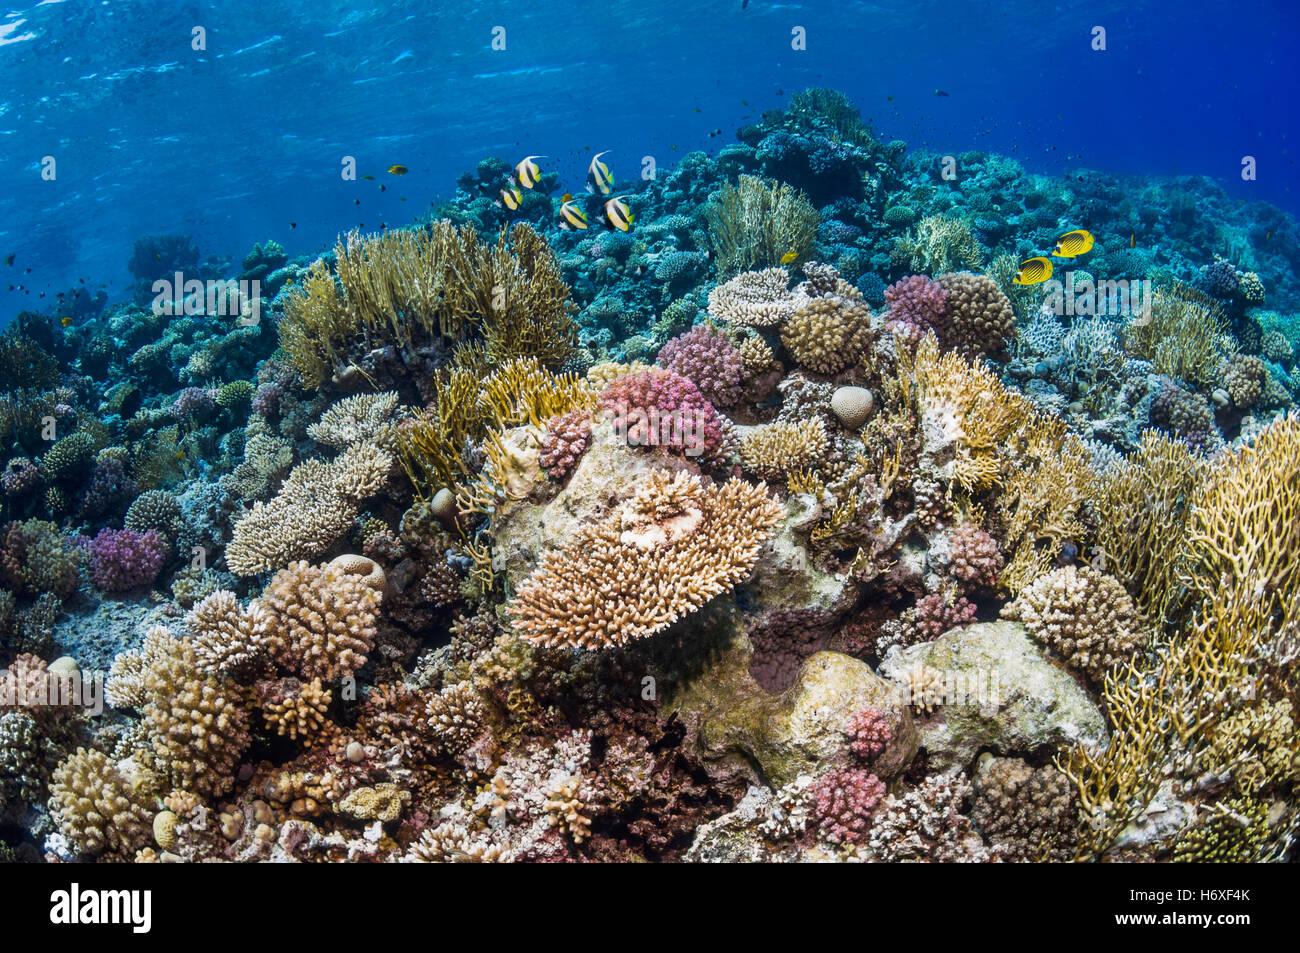 Spitze der Korallenriff mit roten Meer Bannerfish [Heniochus Intermedius] und roten Meer Butterflyfish [Chaetodontidae Stockbild